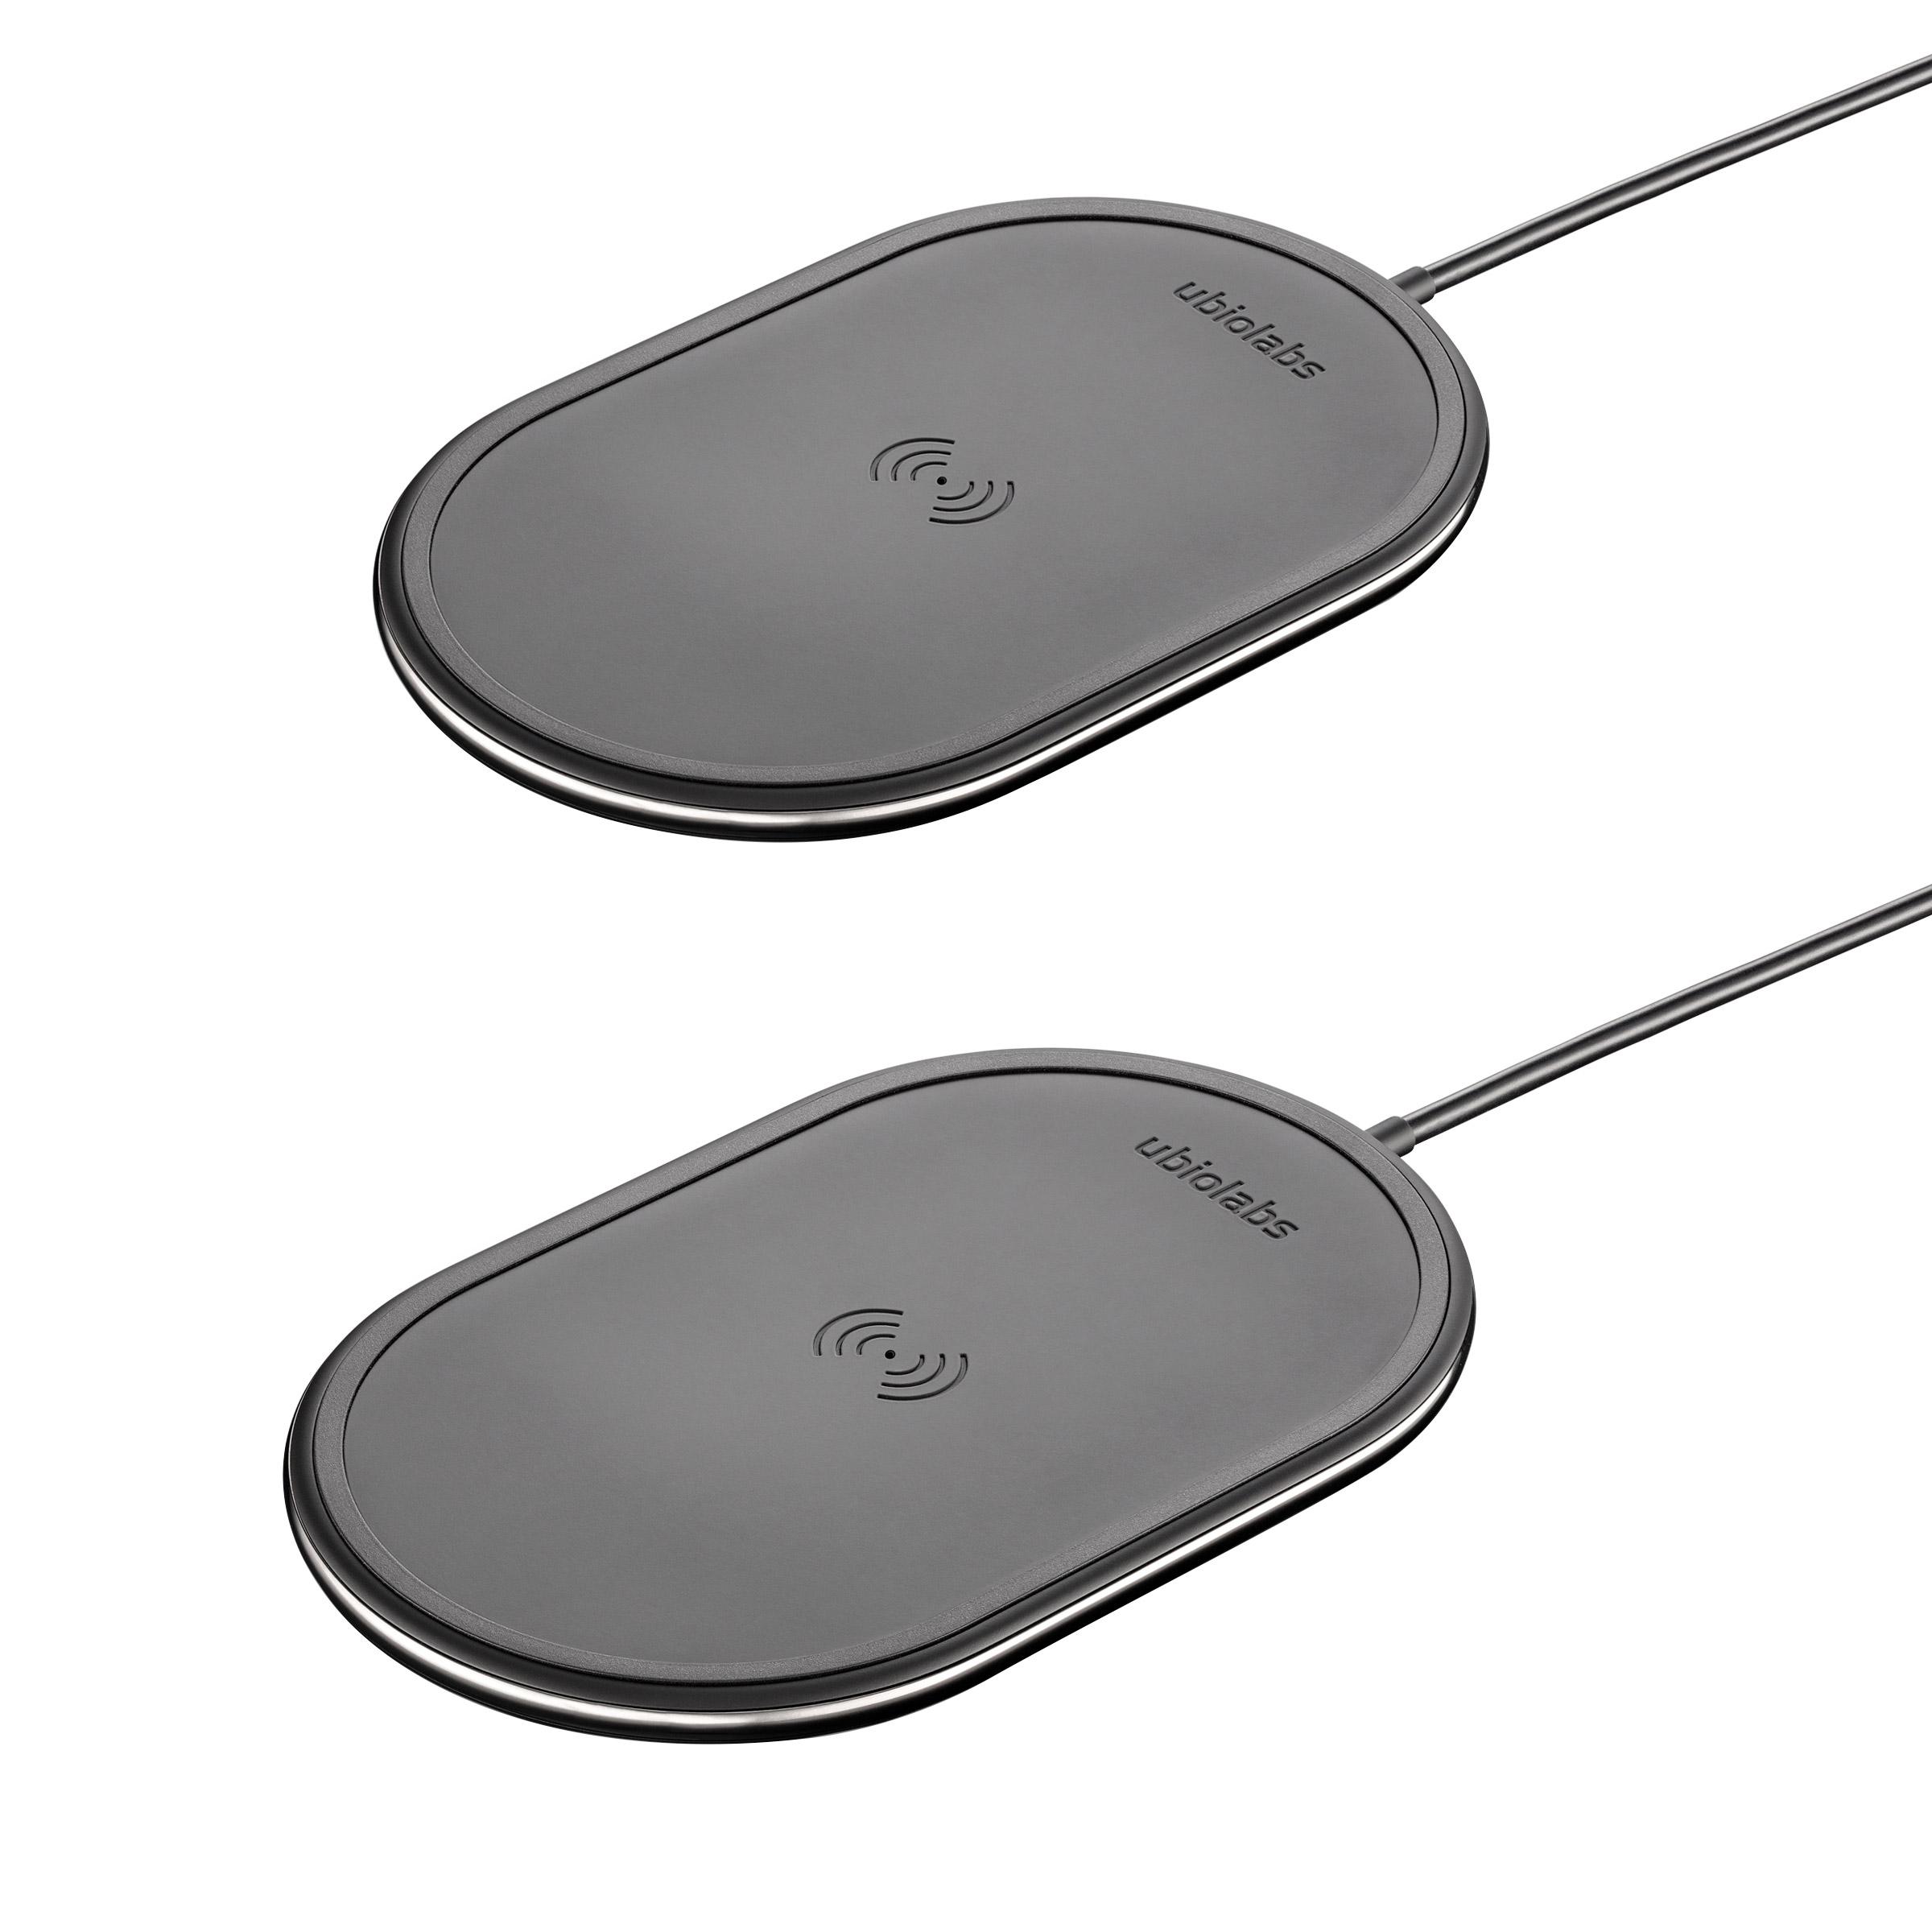 Ubio Labs 10W Qi Wireless Charging Pad 2-pack